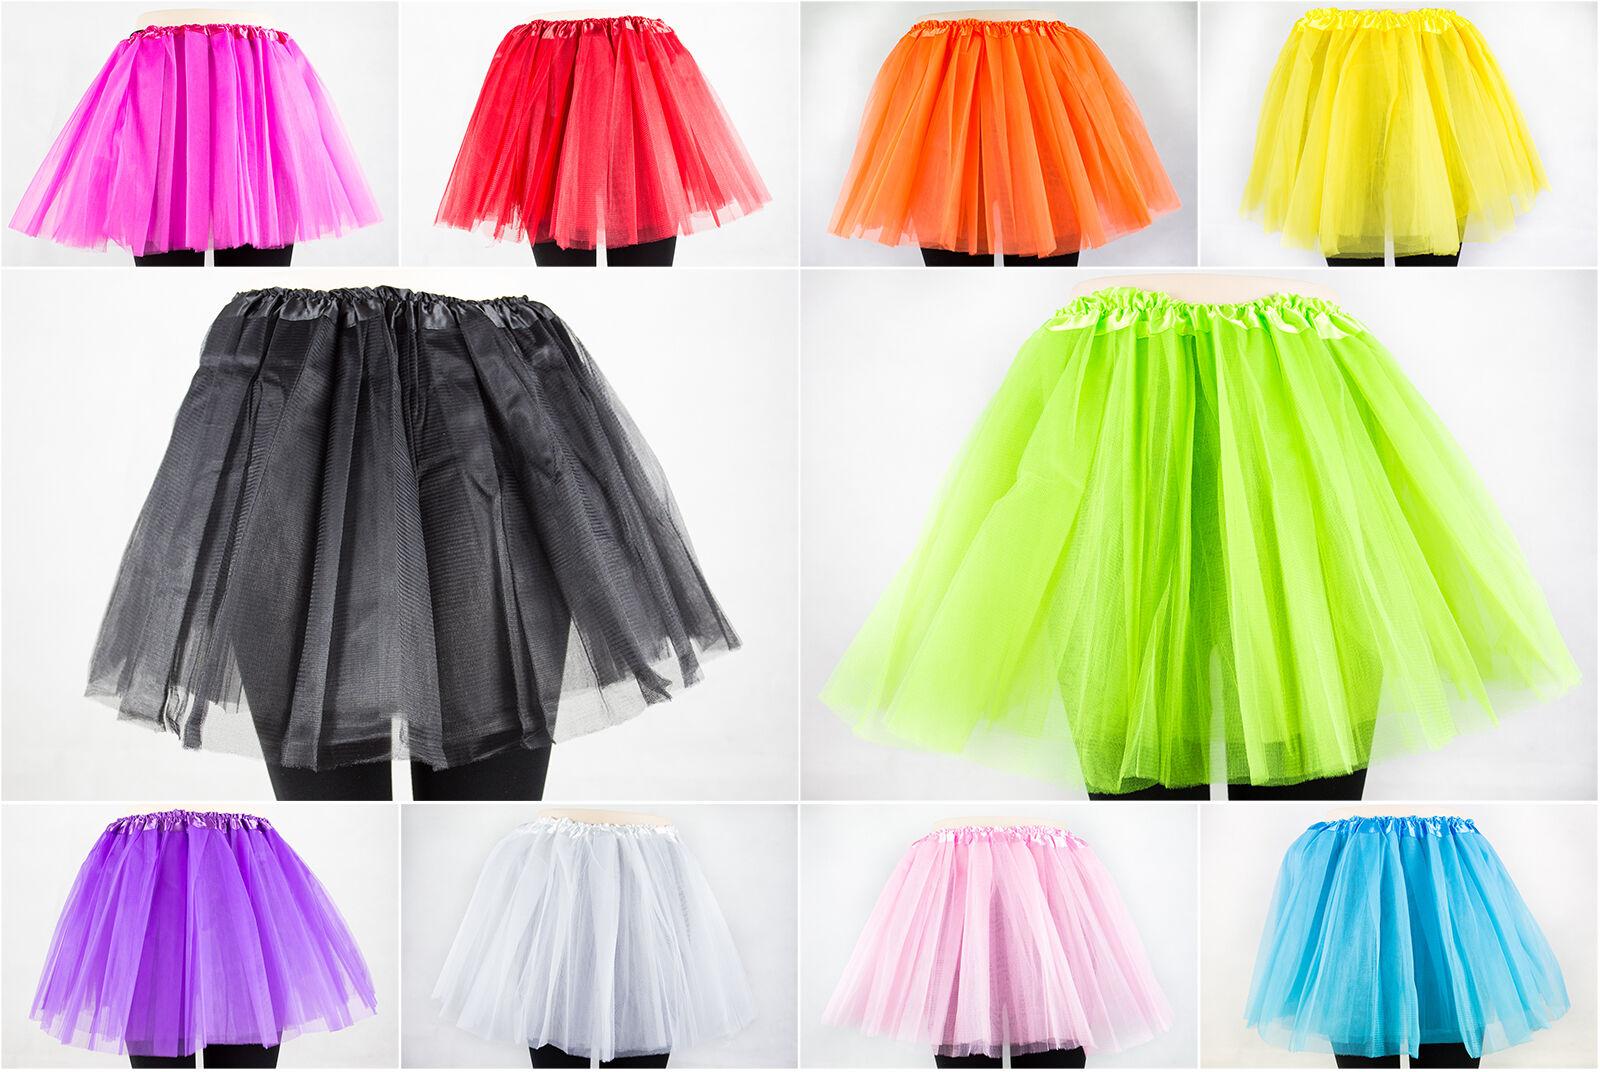 Damen Tütü Tutu Minirock Petticoat Tanzkleid Ballettrock Unterrock M-XL